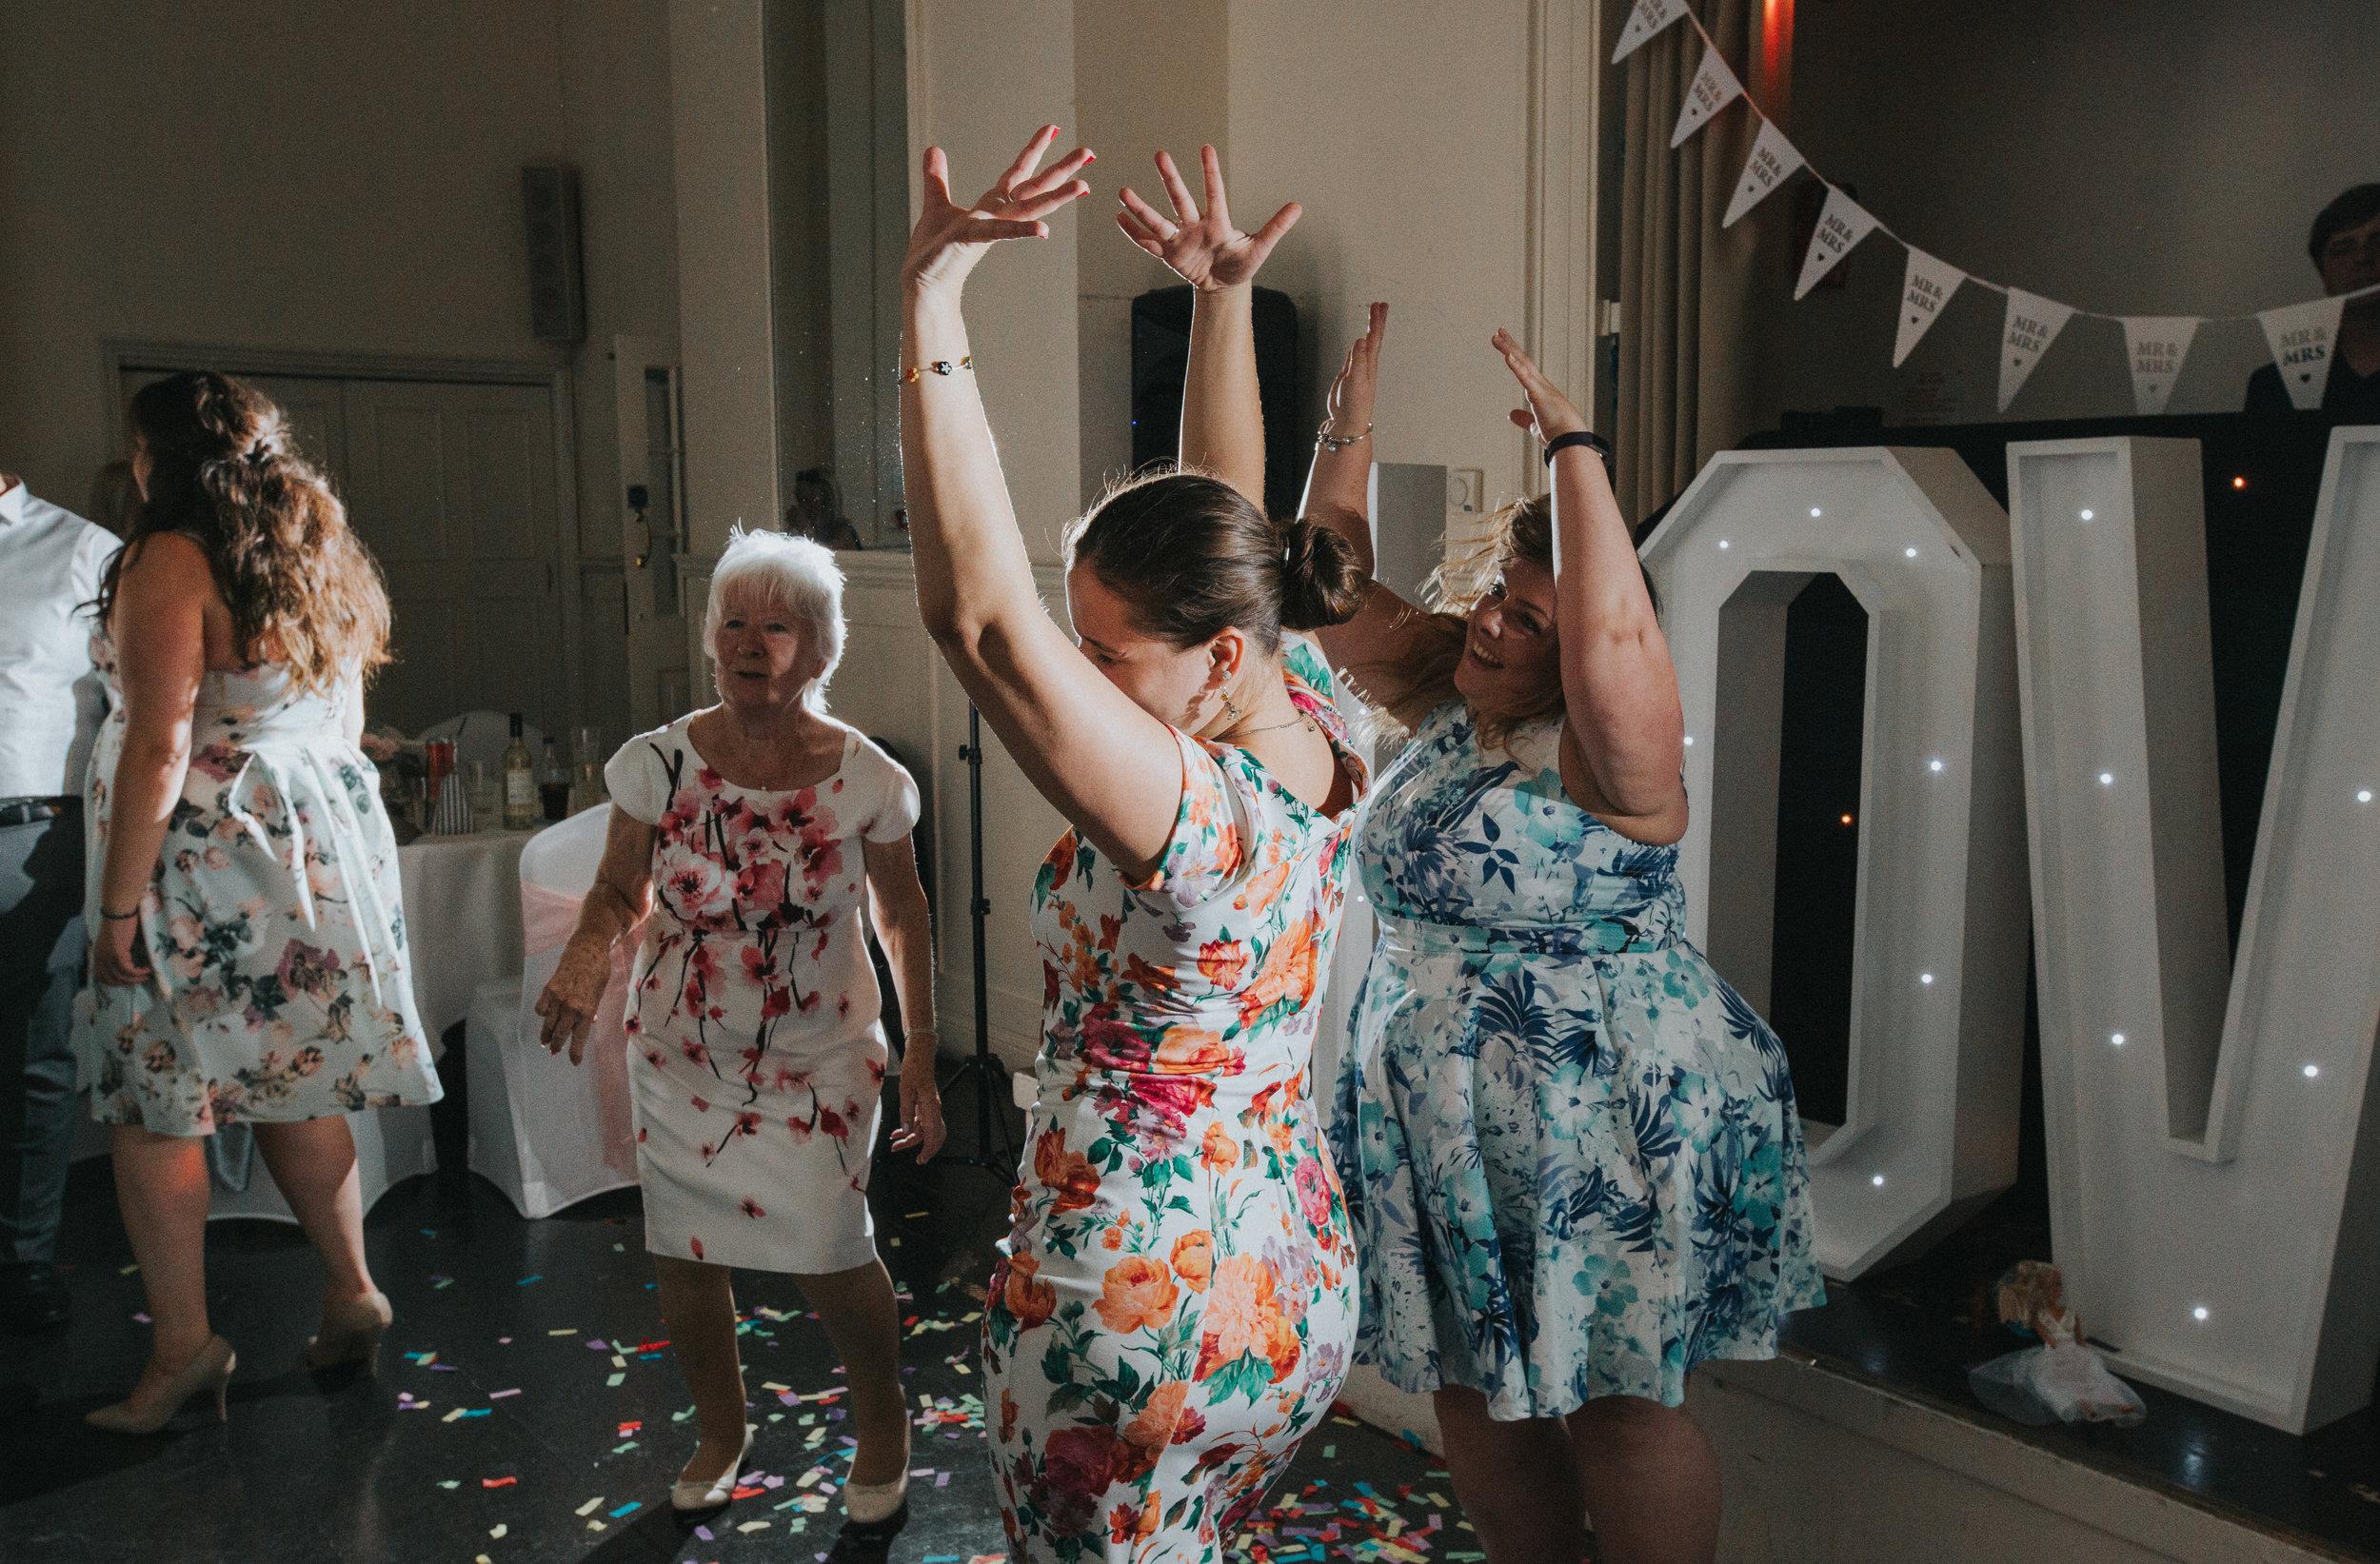 hitchin-hertfordshire-london-wedding-photography-catholic-church-sun-inn-reception-57